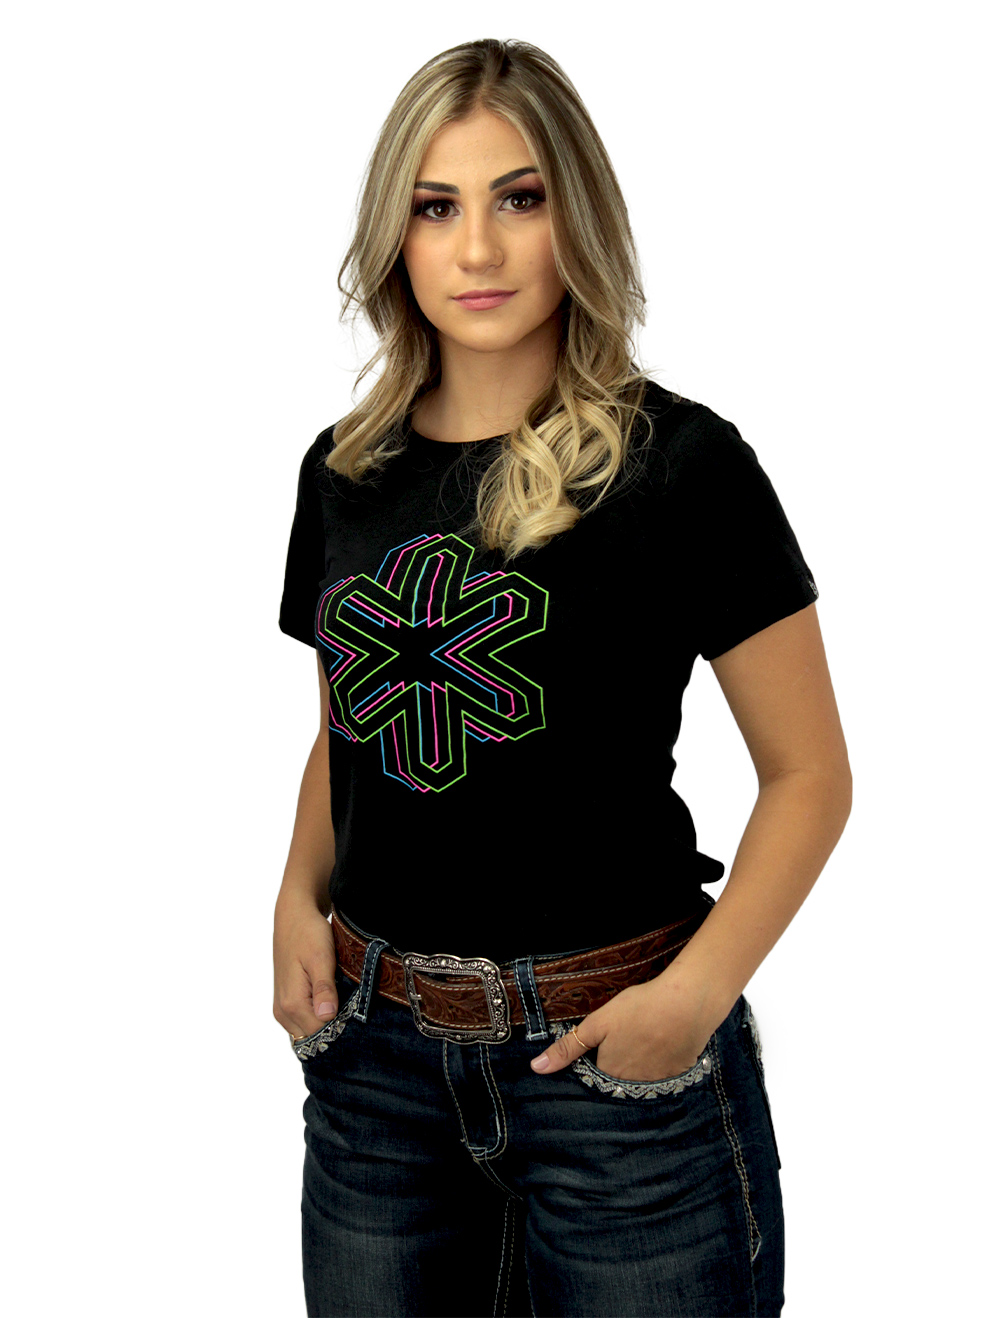 Camiseta Feminina Preta com Silk Colorido